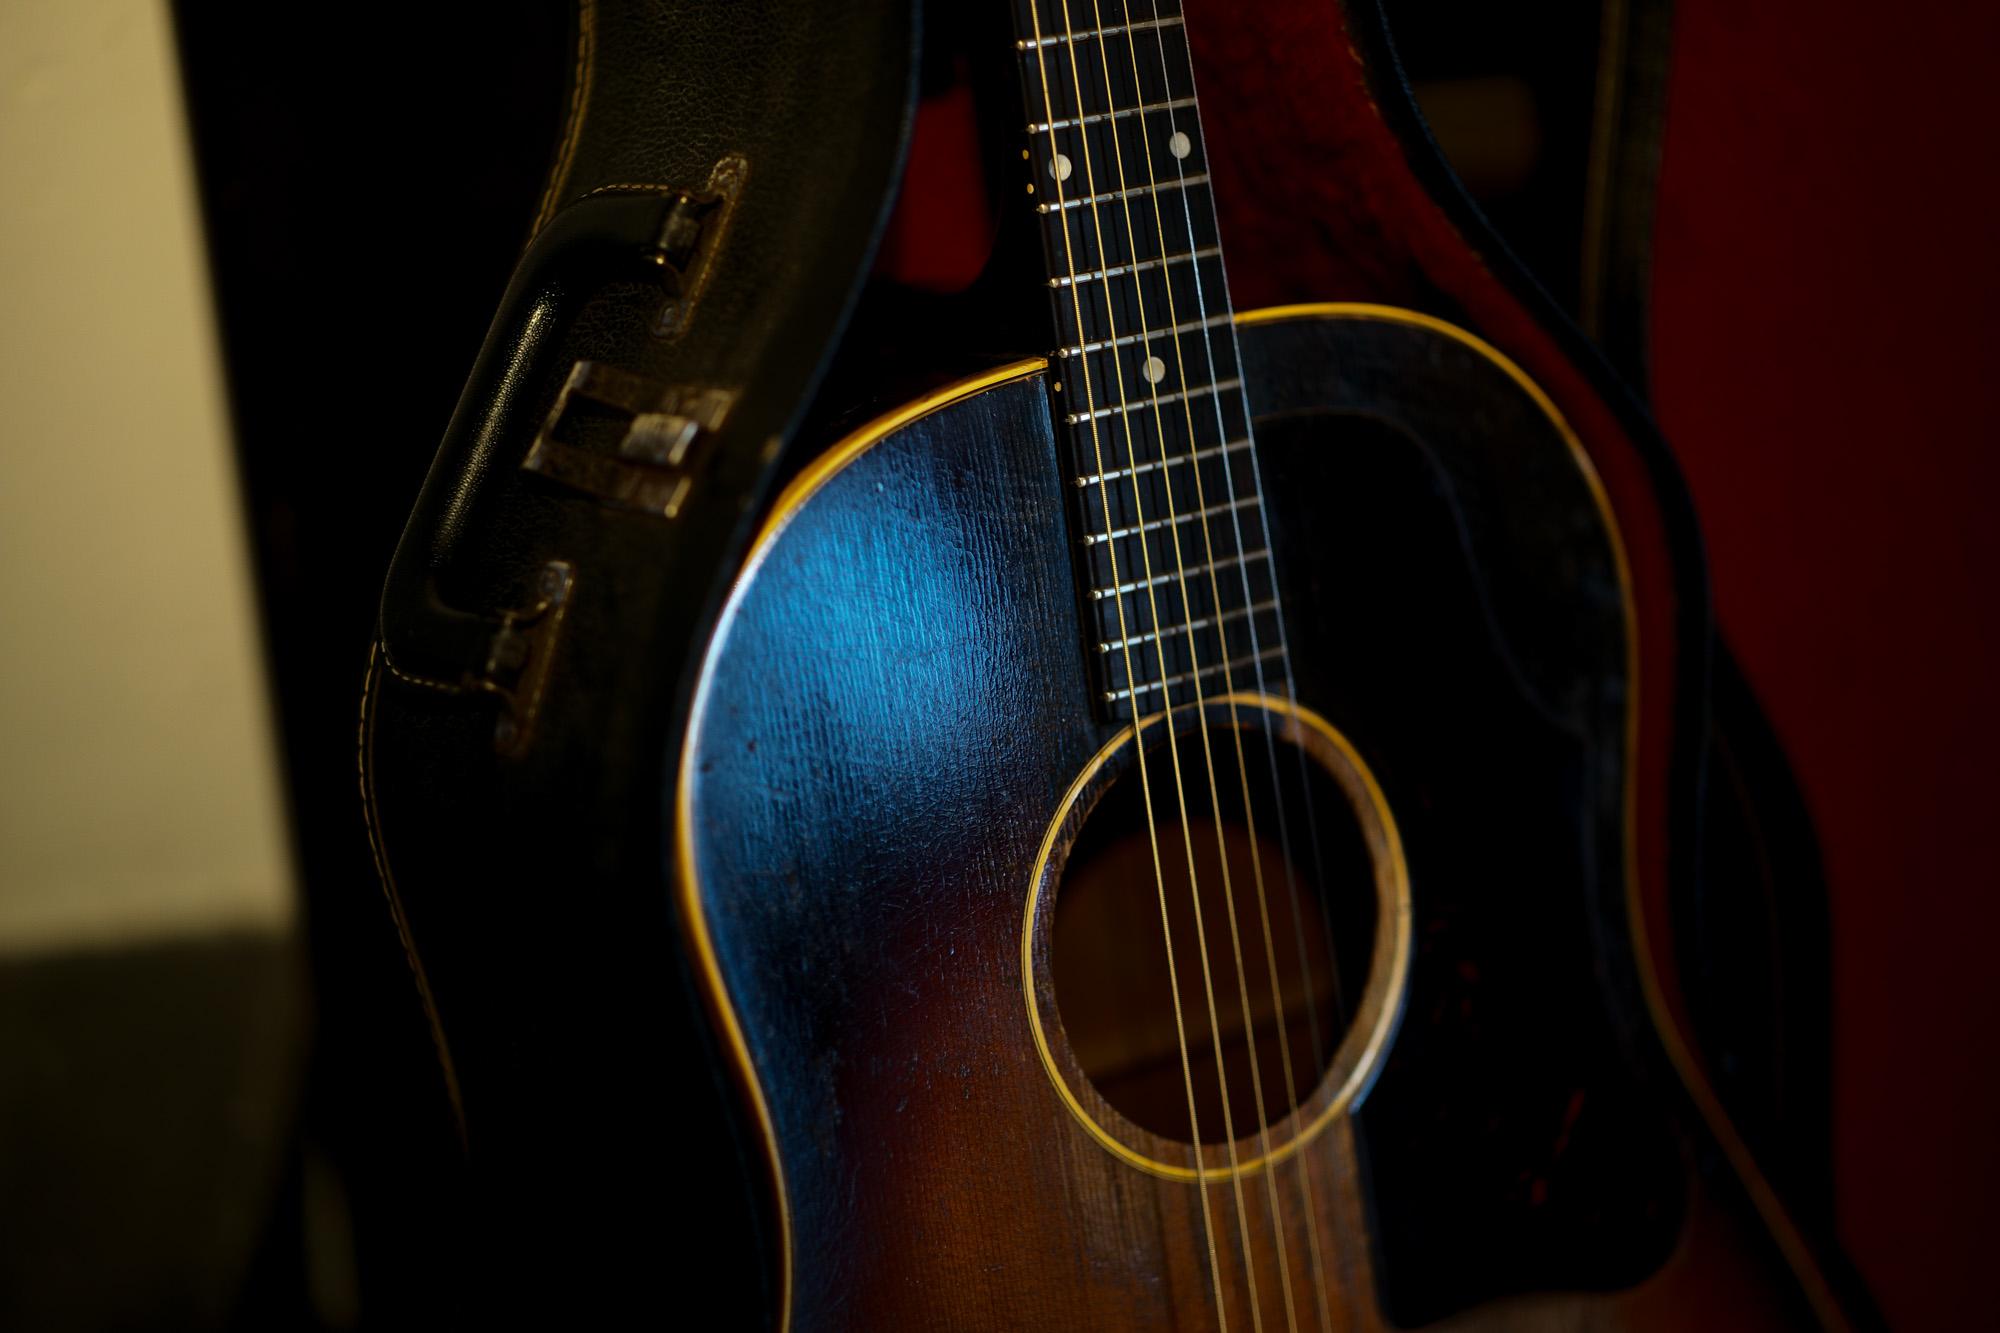 Gibson J-45 Adj.1959年製 ギブソン ヴィンテージギター ビンテージギター MADE IN USA アメリカ製 ギター guitar アコギ アコースティックギター 愛知 名古屋 altoediritto アルトエデリット レア物